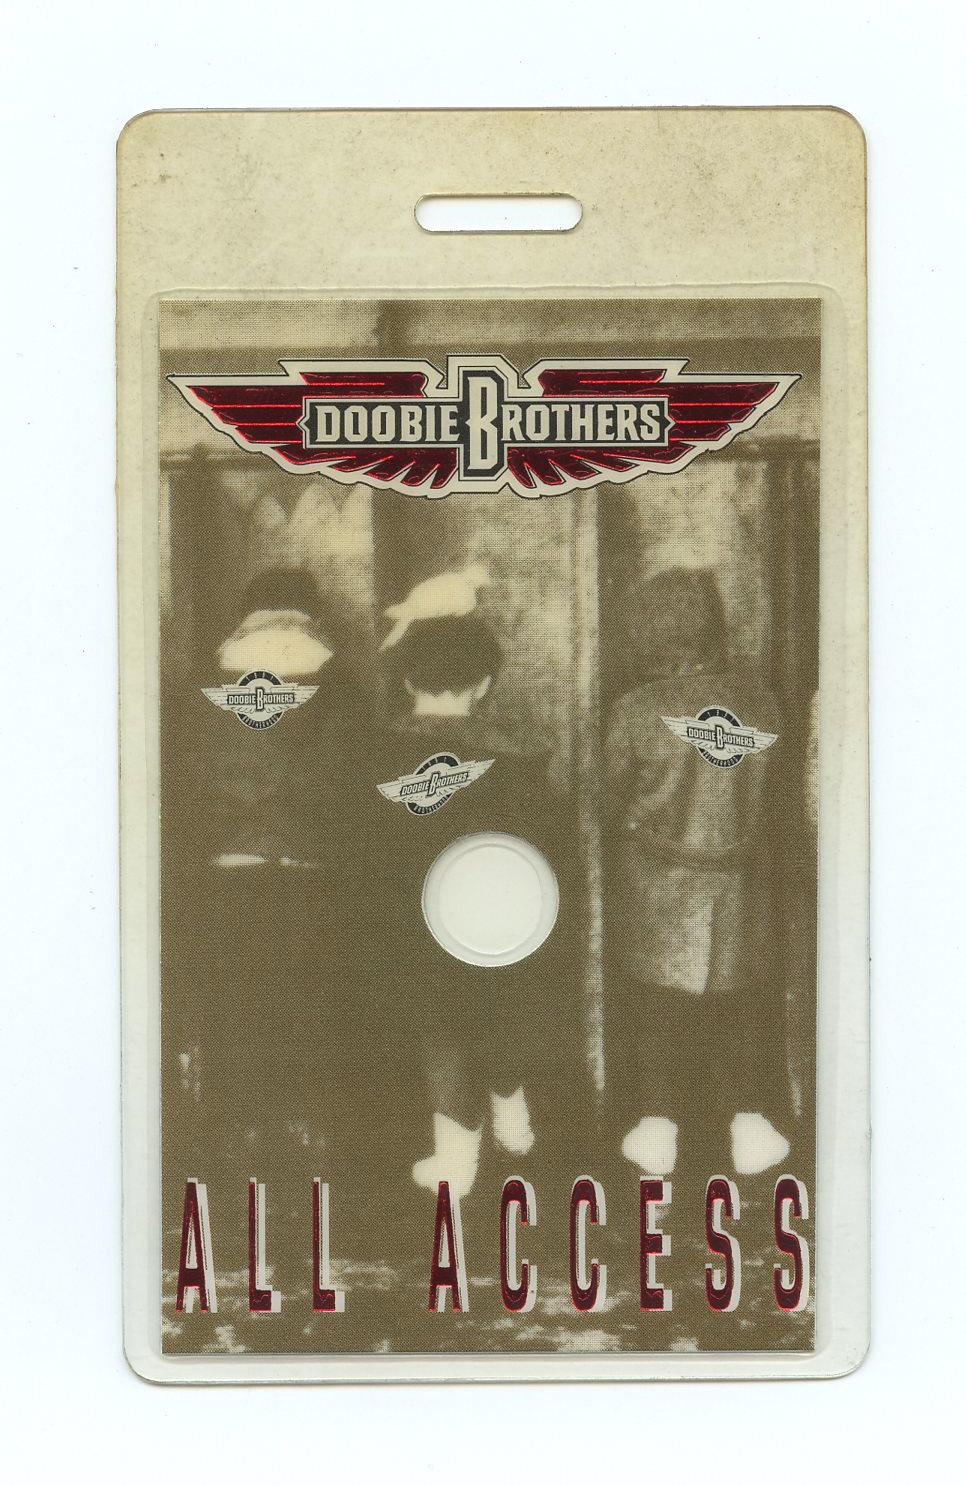 The Doobie Brothers Backstage Pass Laminated 1991 Brotherhood Album Promo Tour